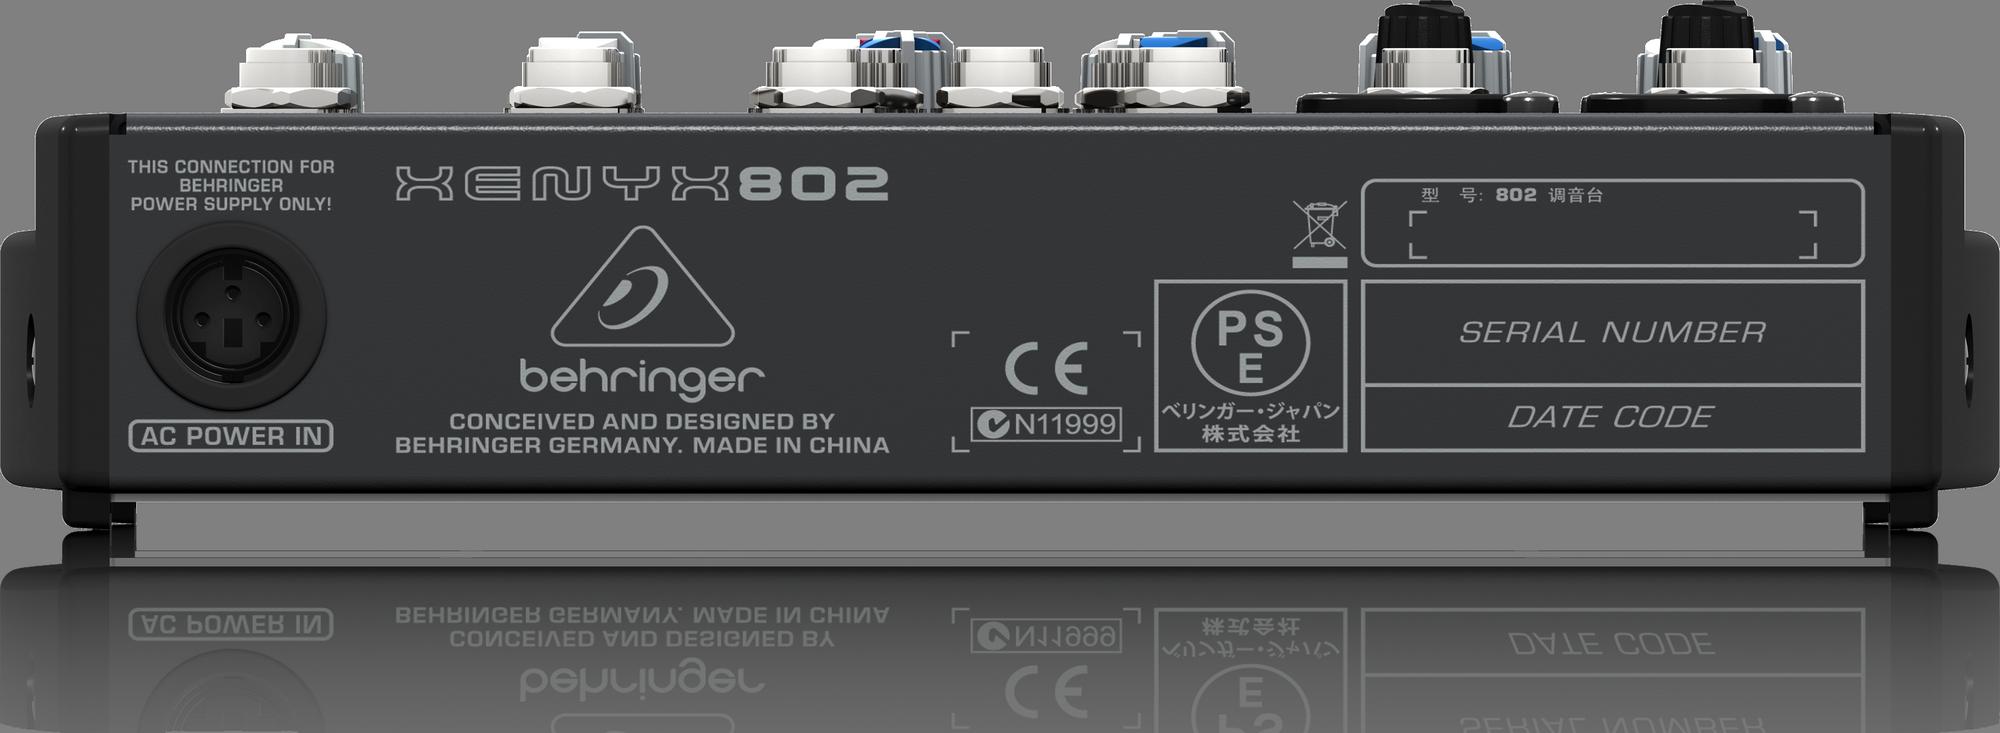 Behringer Xenyx 802 - Analogue Mixer